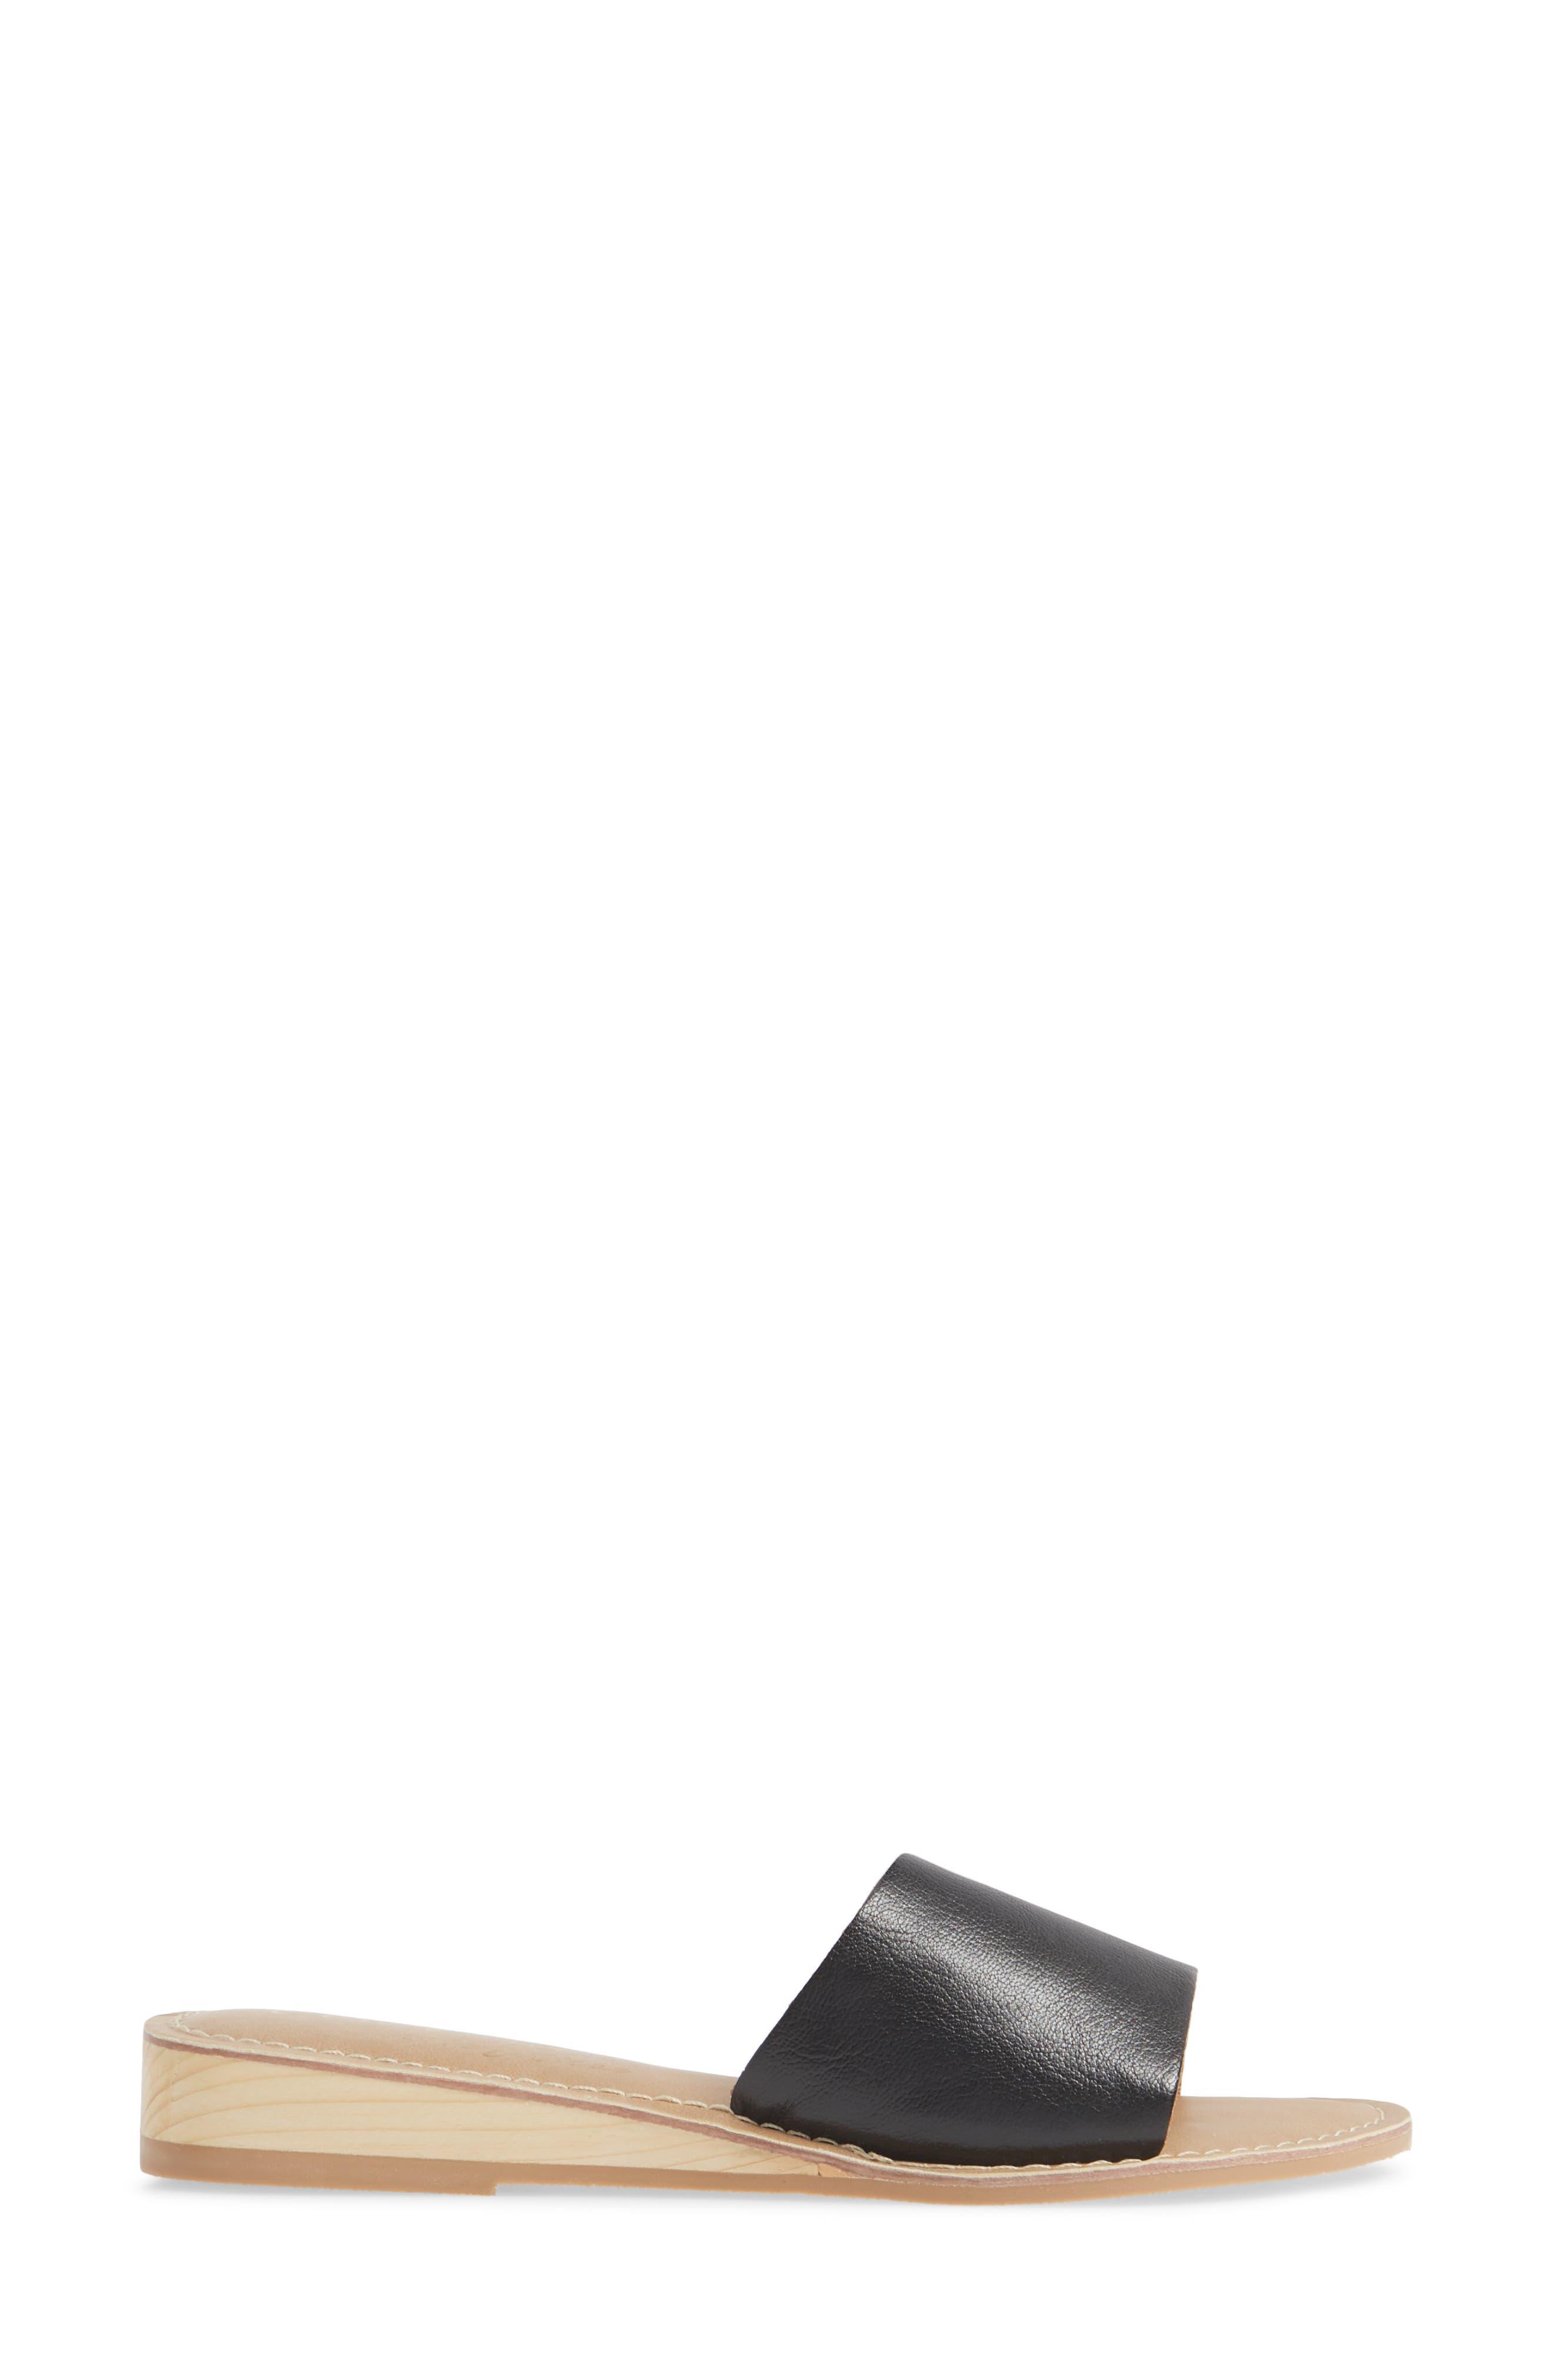 COCONUTS BY MATISSE, Tiki Slide Sandal, Alternate thumbnail 3, color, BLACK LEATHER